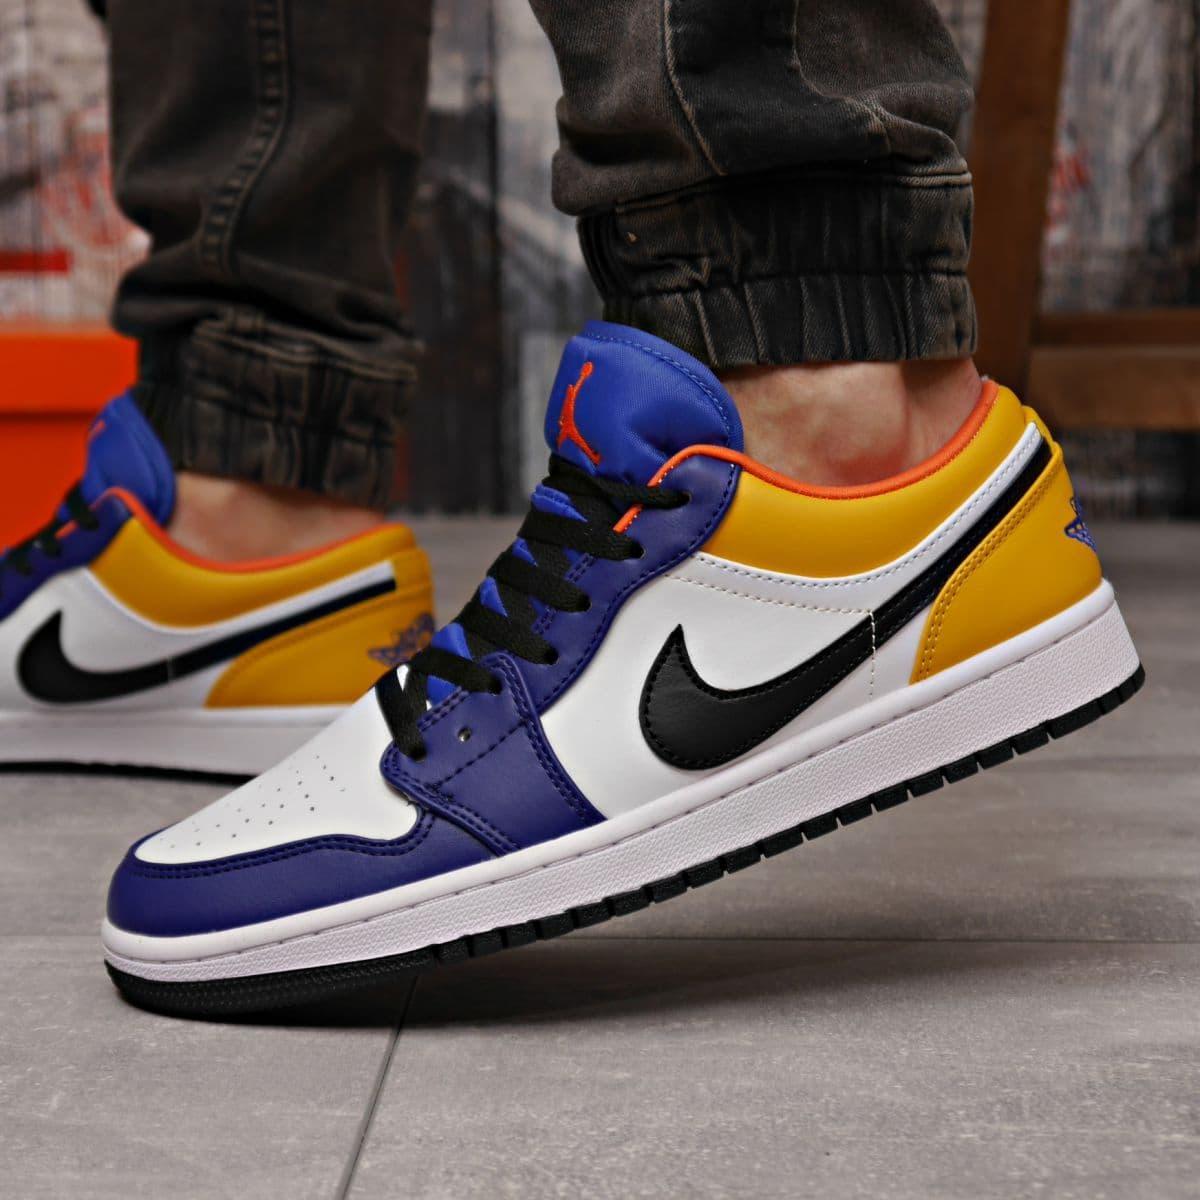 Мужские кроссовки Nike Air Jordan Low